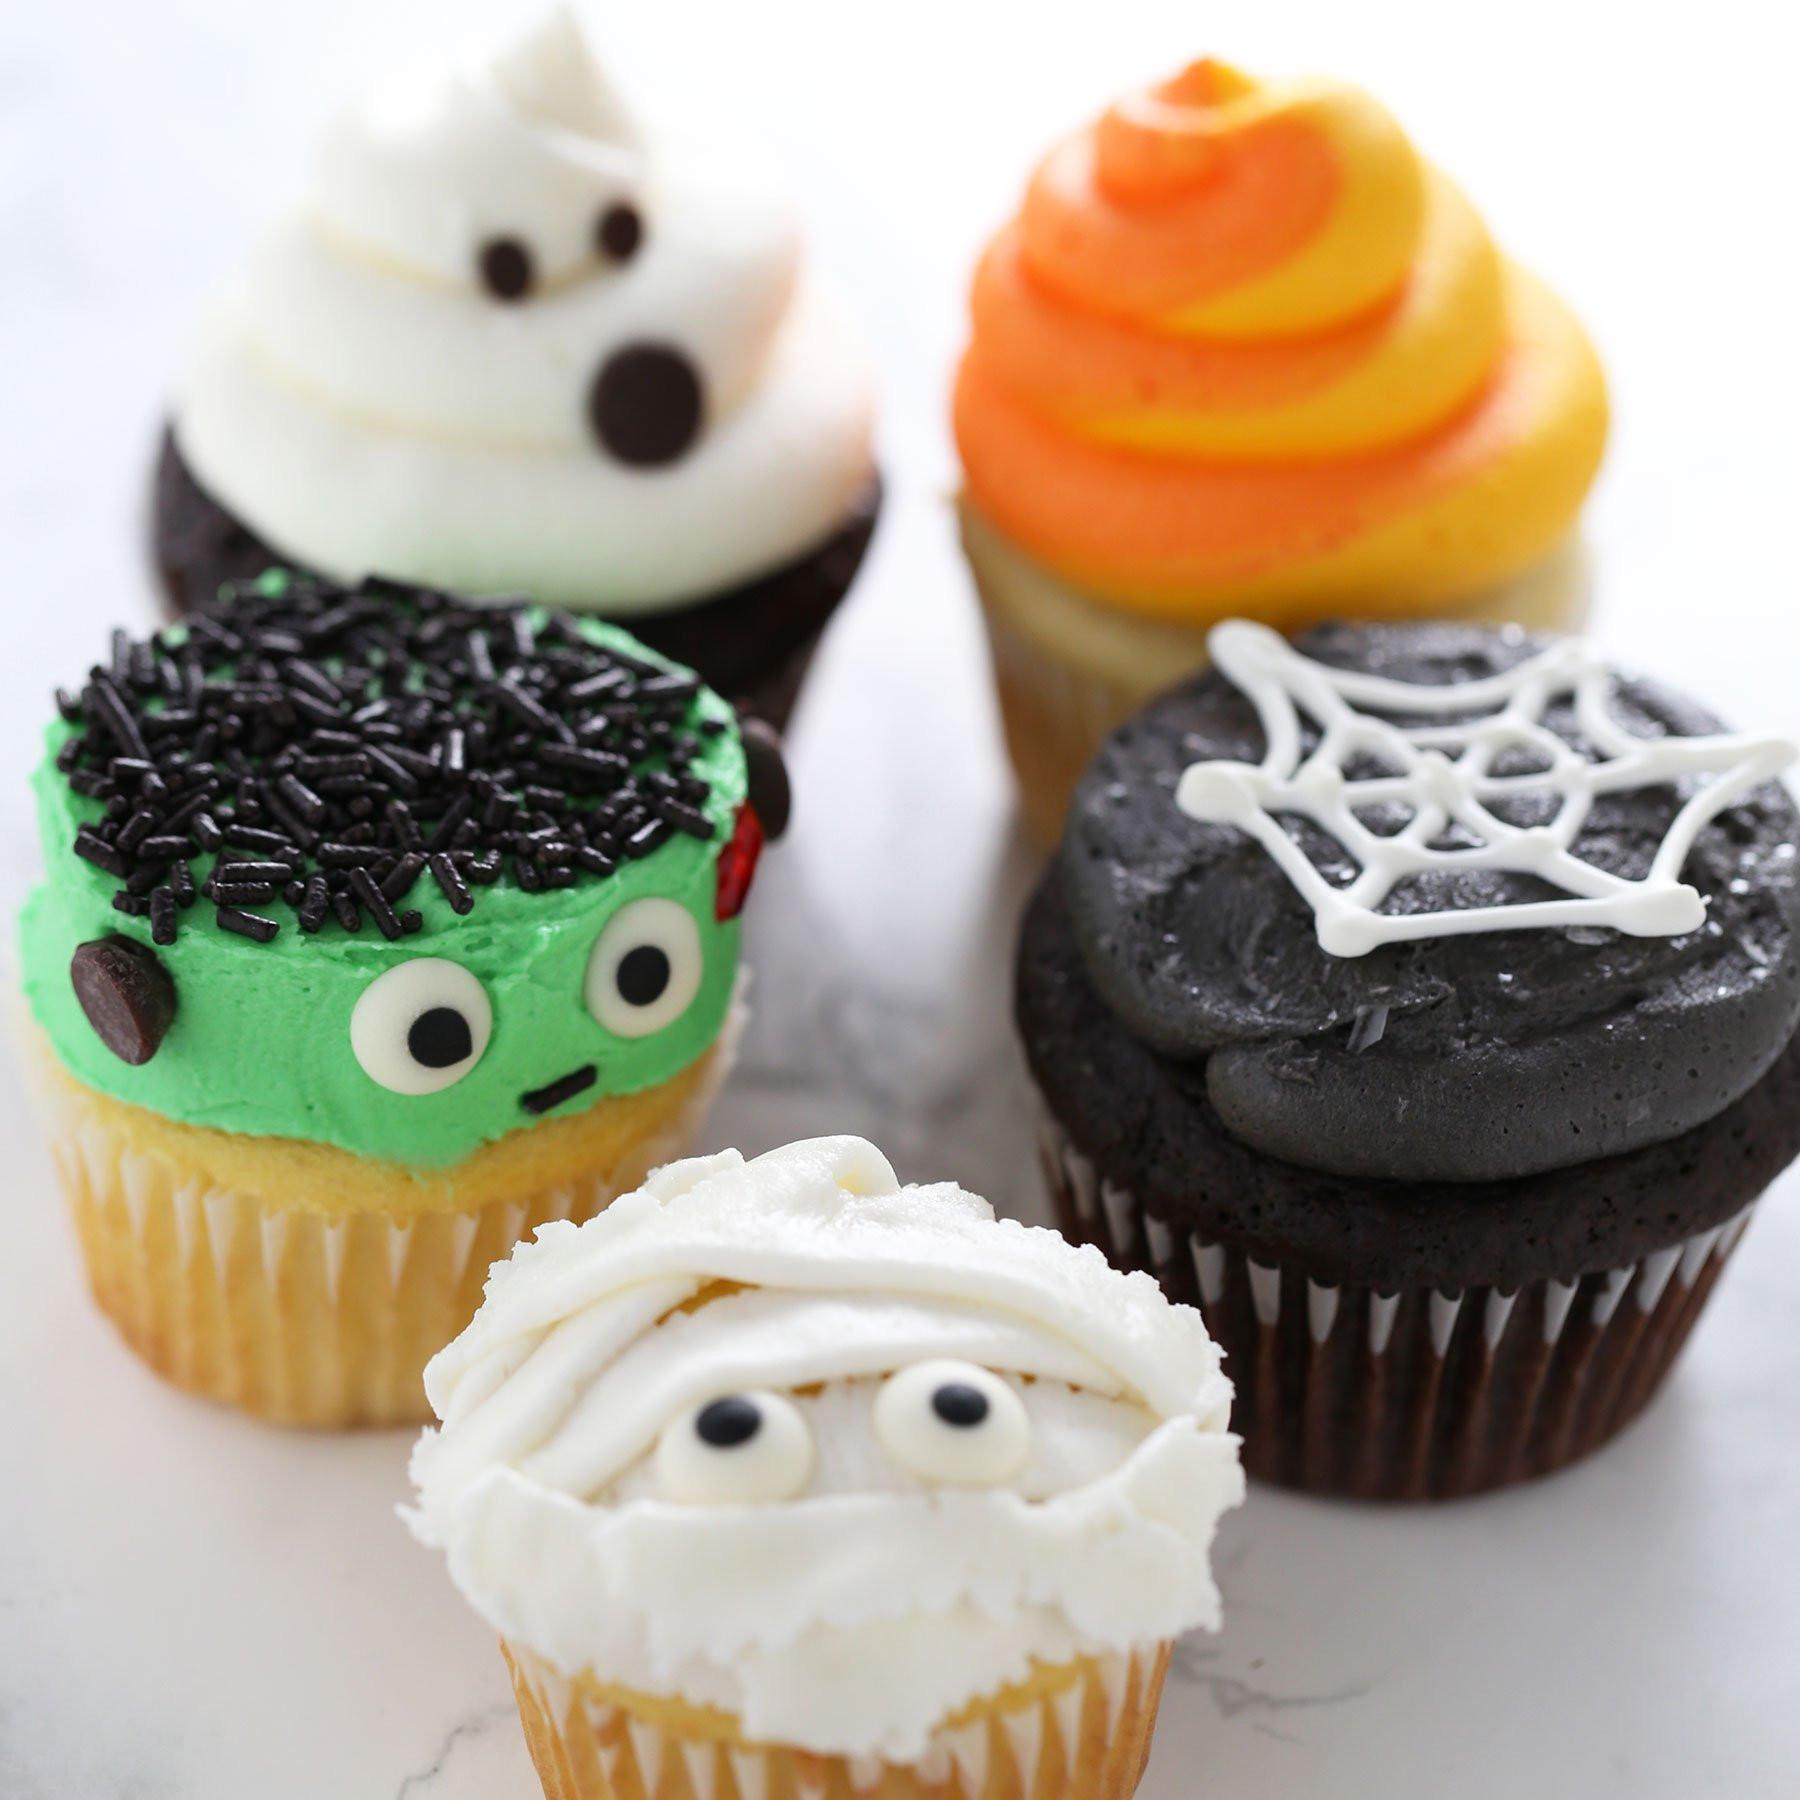 Halloween Cupcakes Decorating Ideas  How to Make Halloween Cupcakes Handle the Heat